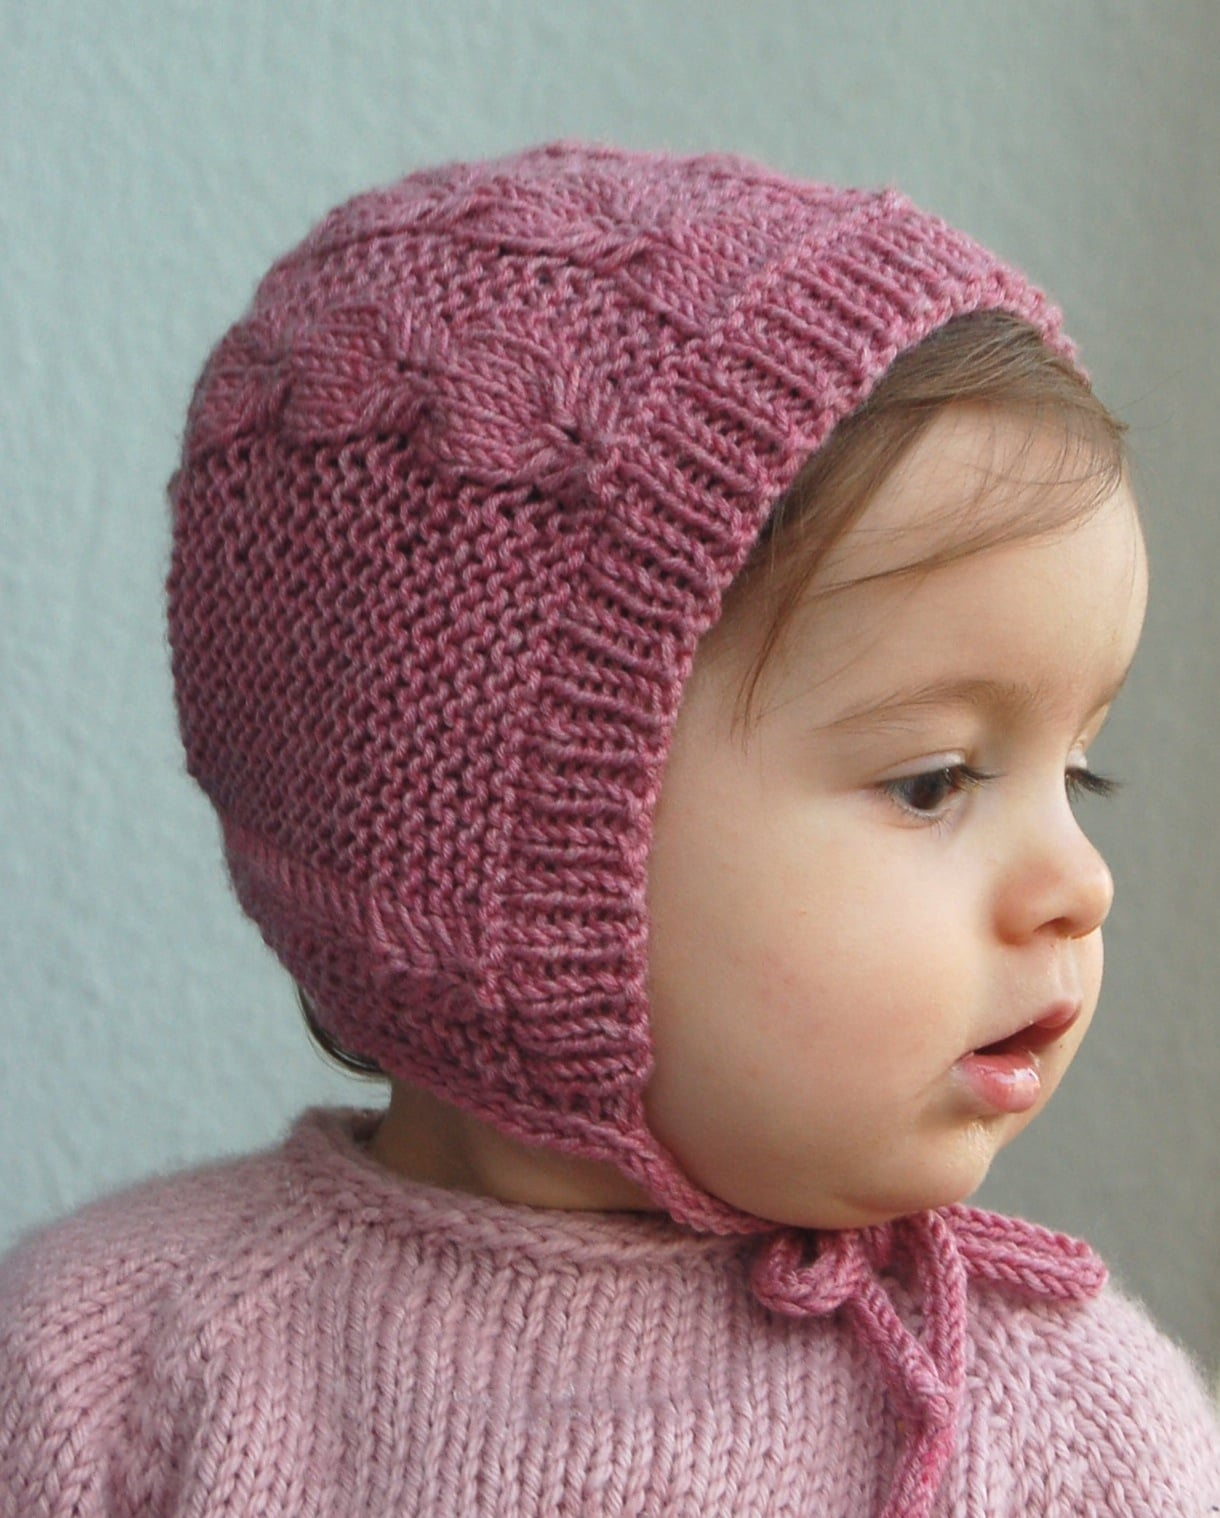 Silverfox bonnet knitting pattern by Lisa Chemery - Frogginette Knitting Patterns